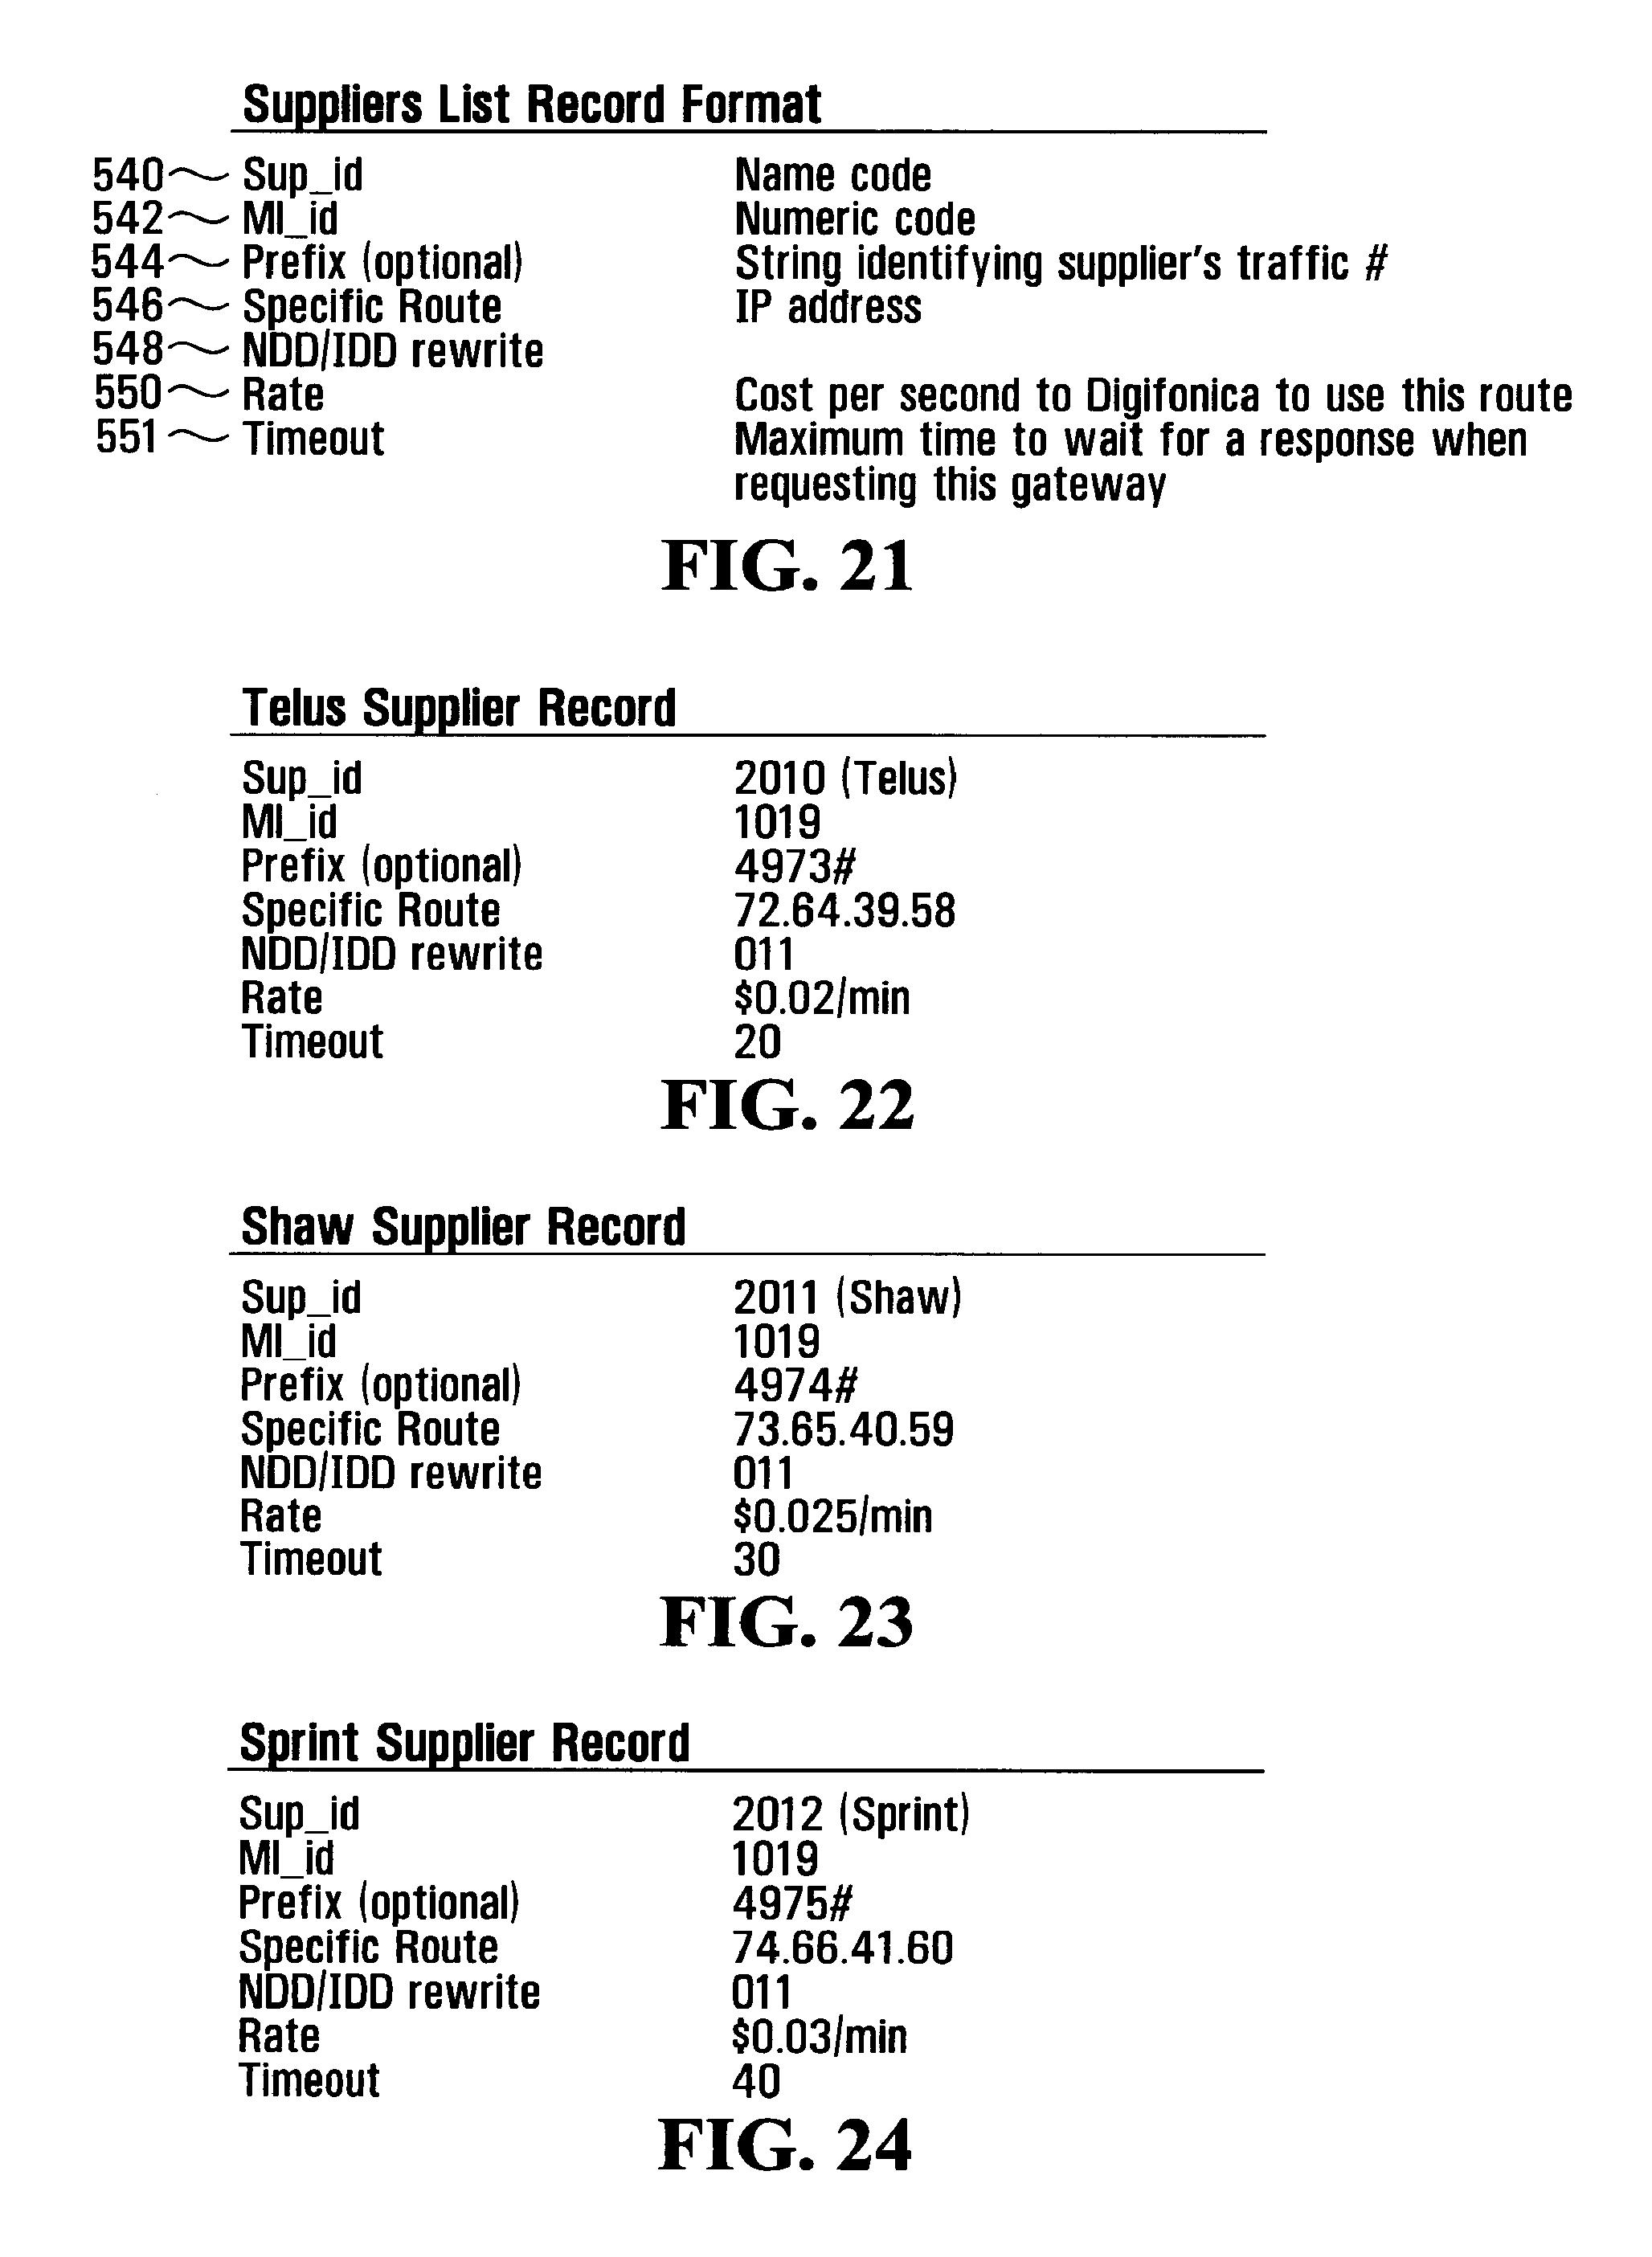 Patent US 9,948,549 B2